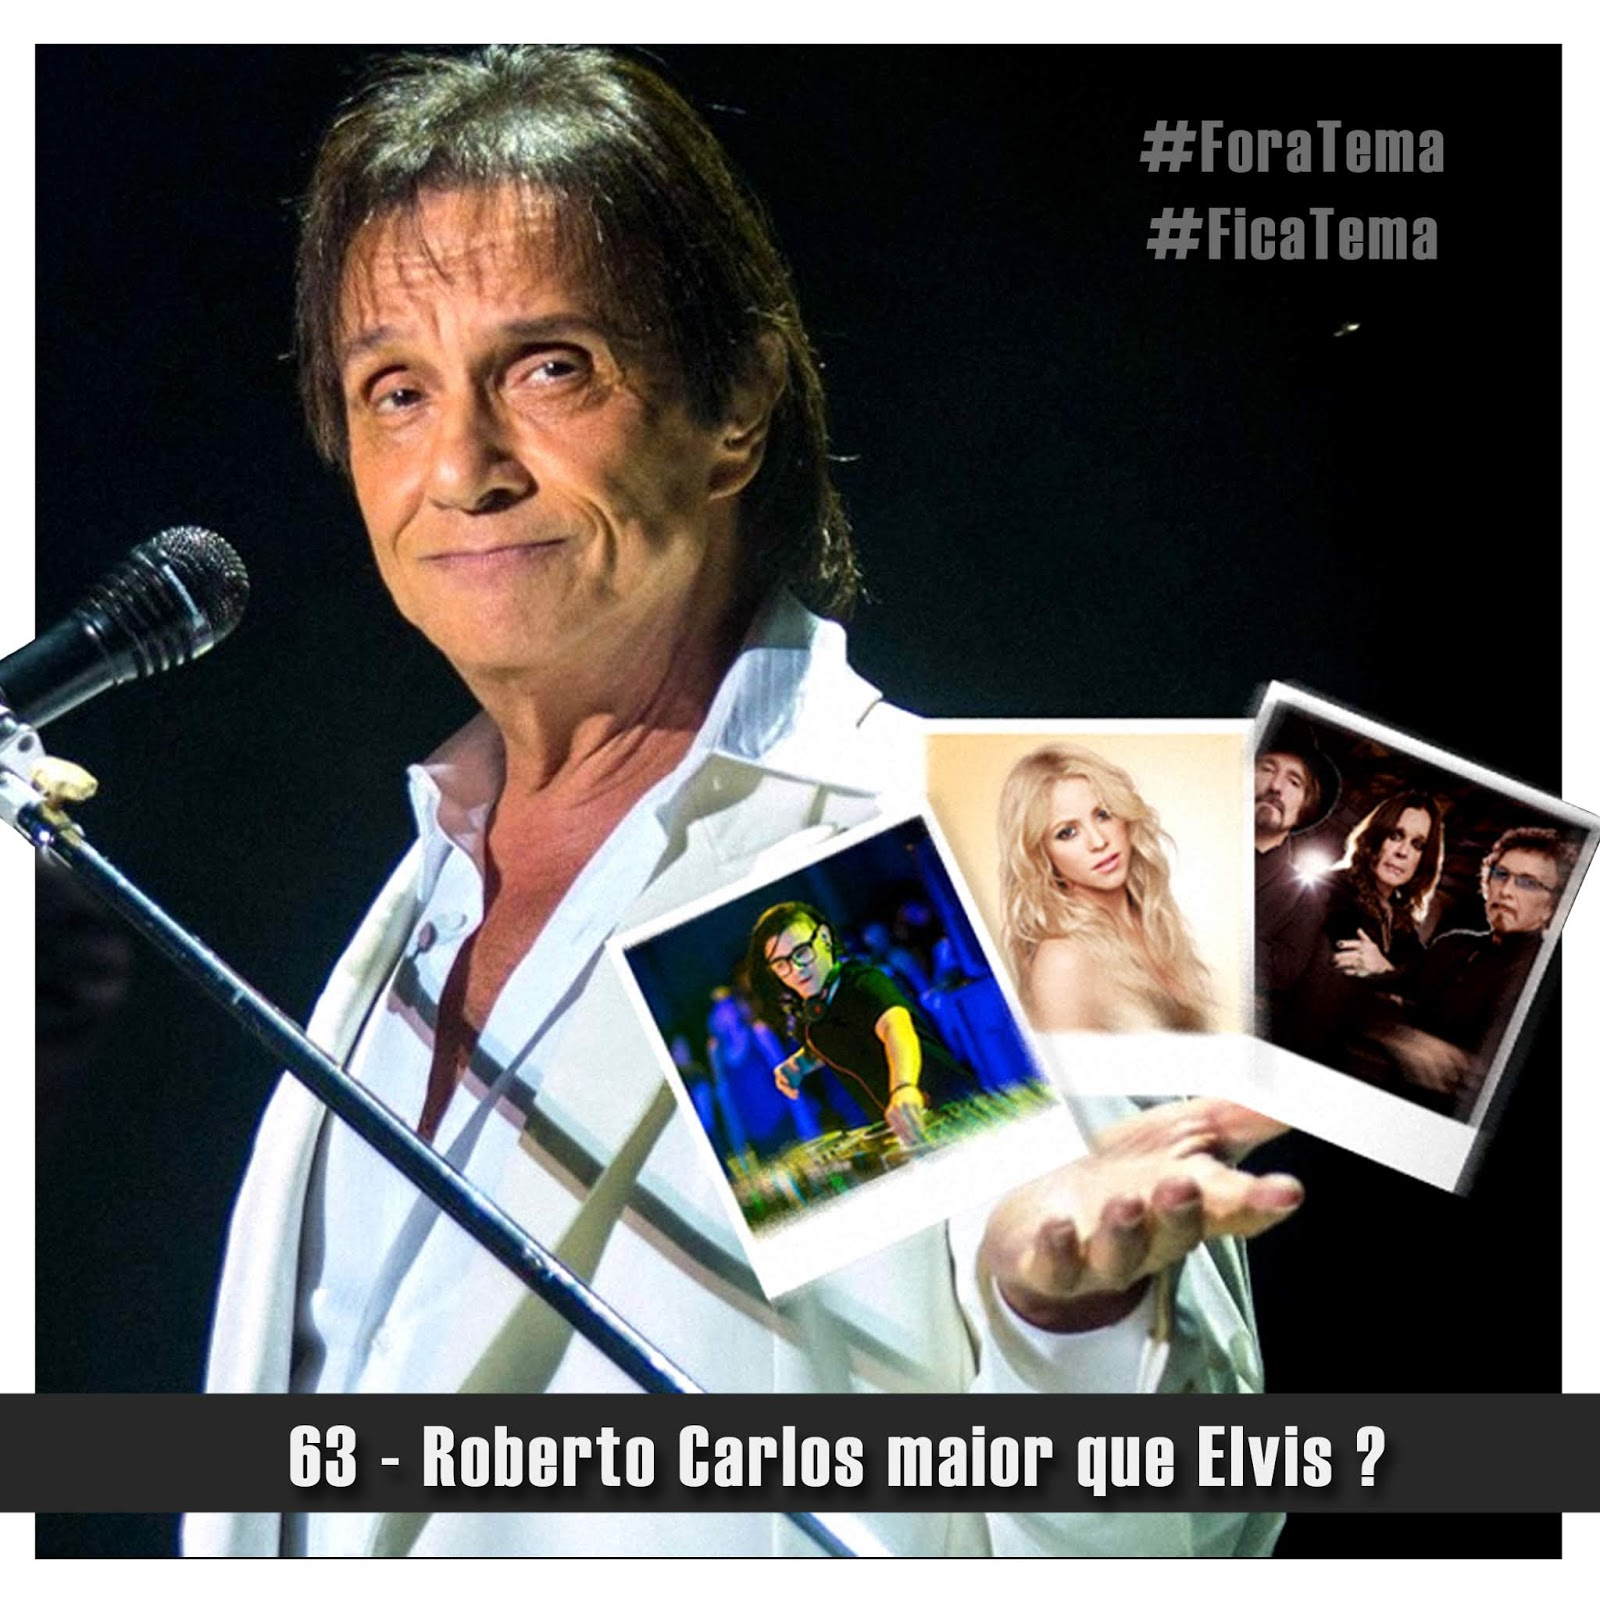 Doublecast 63 - Roberto Carlos maior que Elvis ?